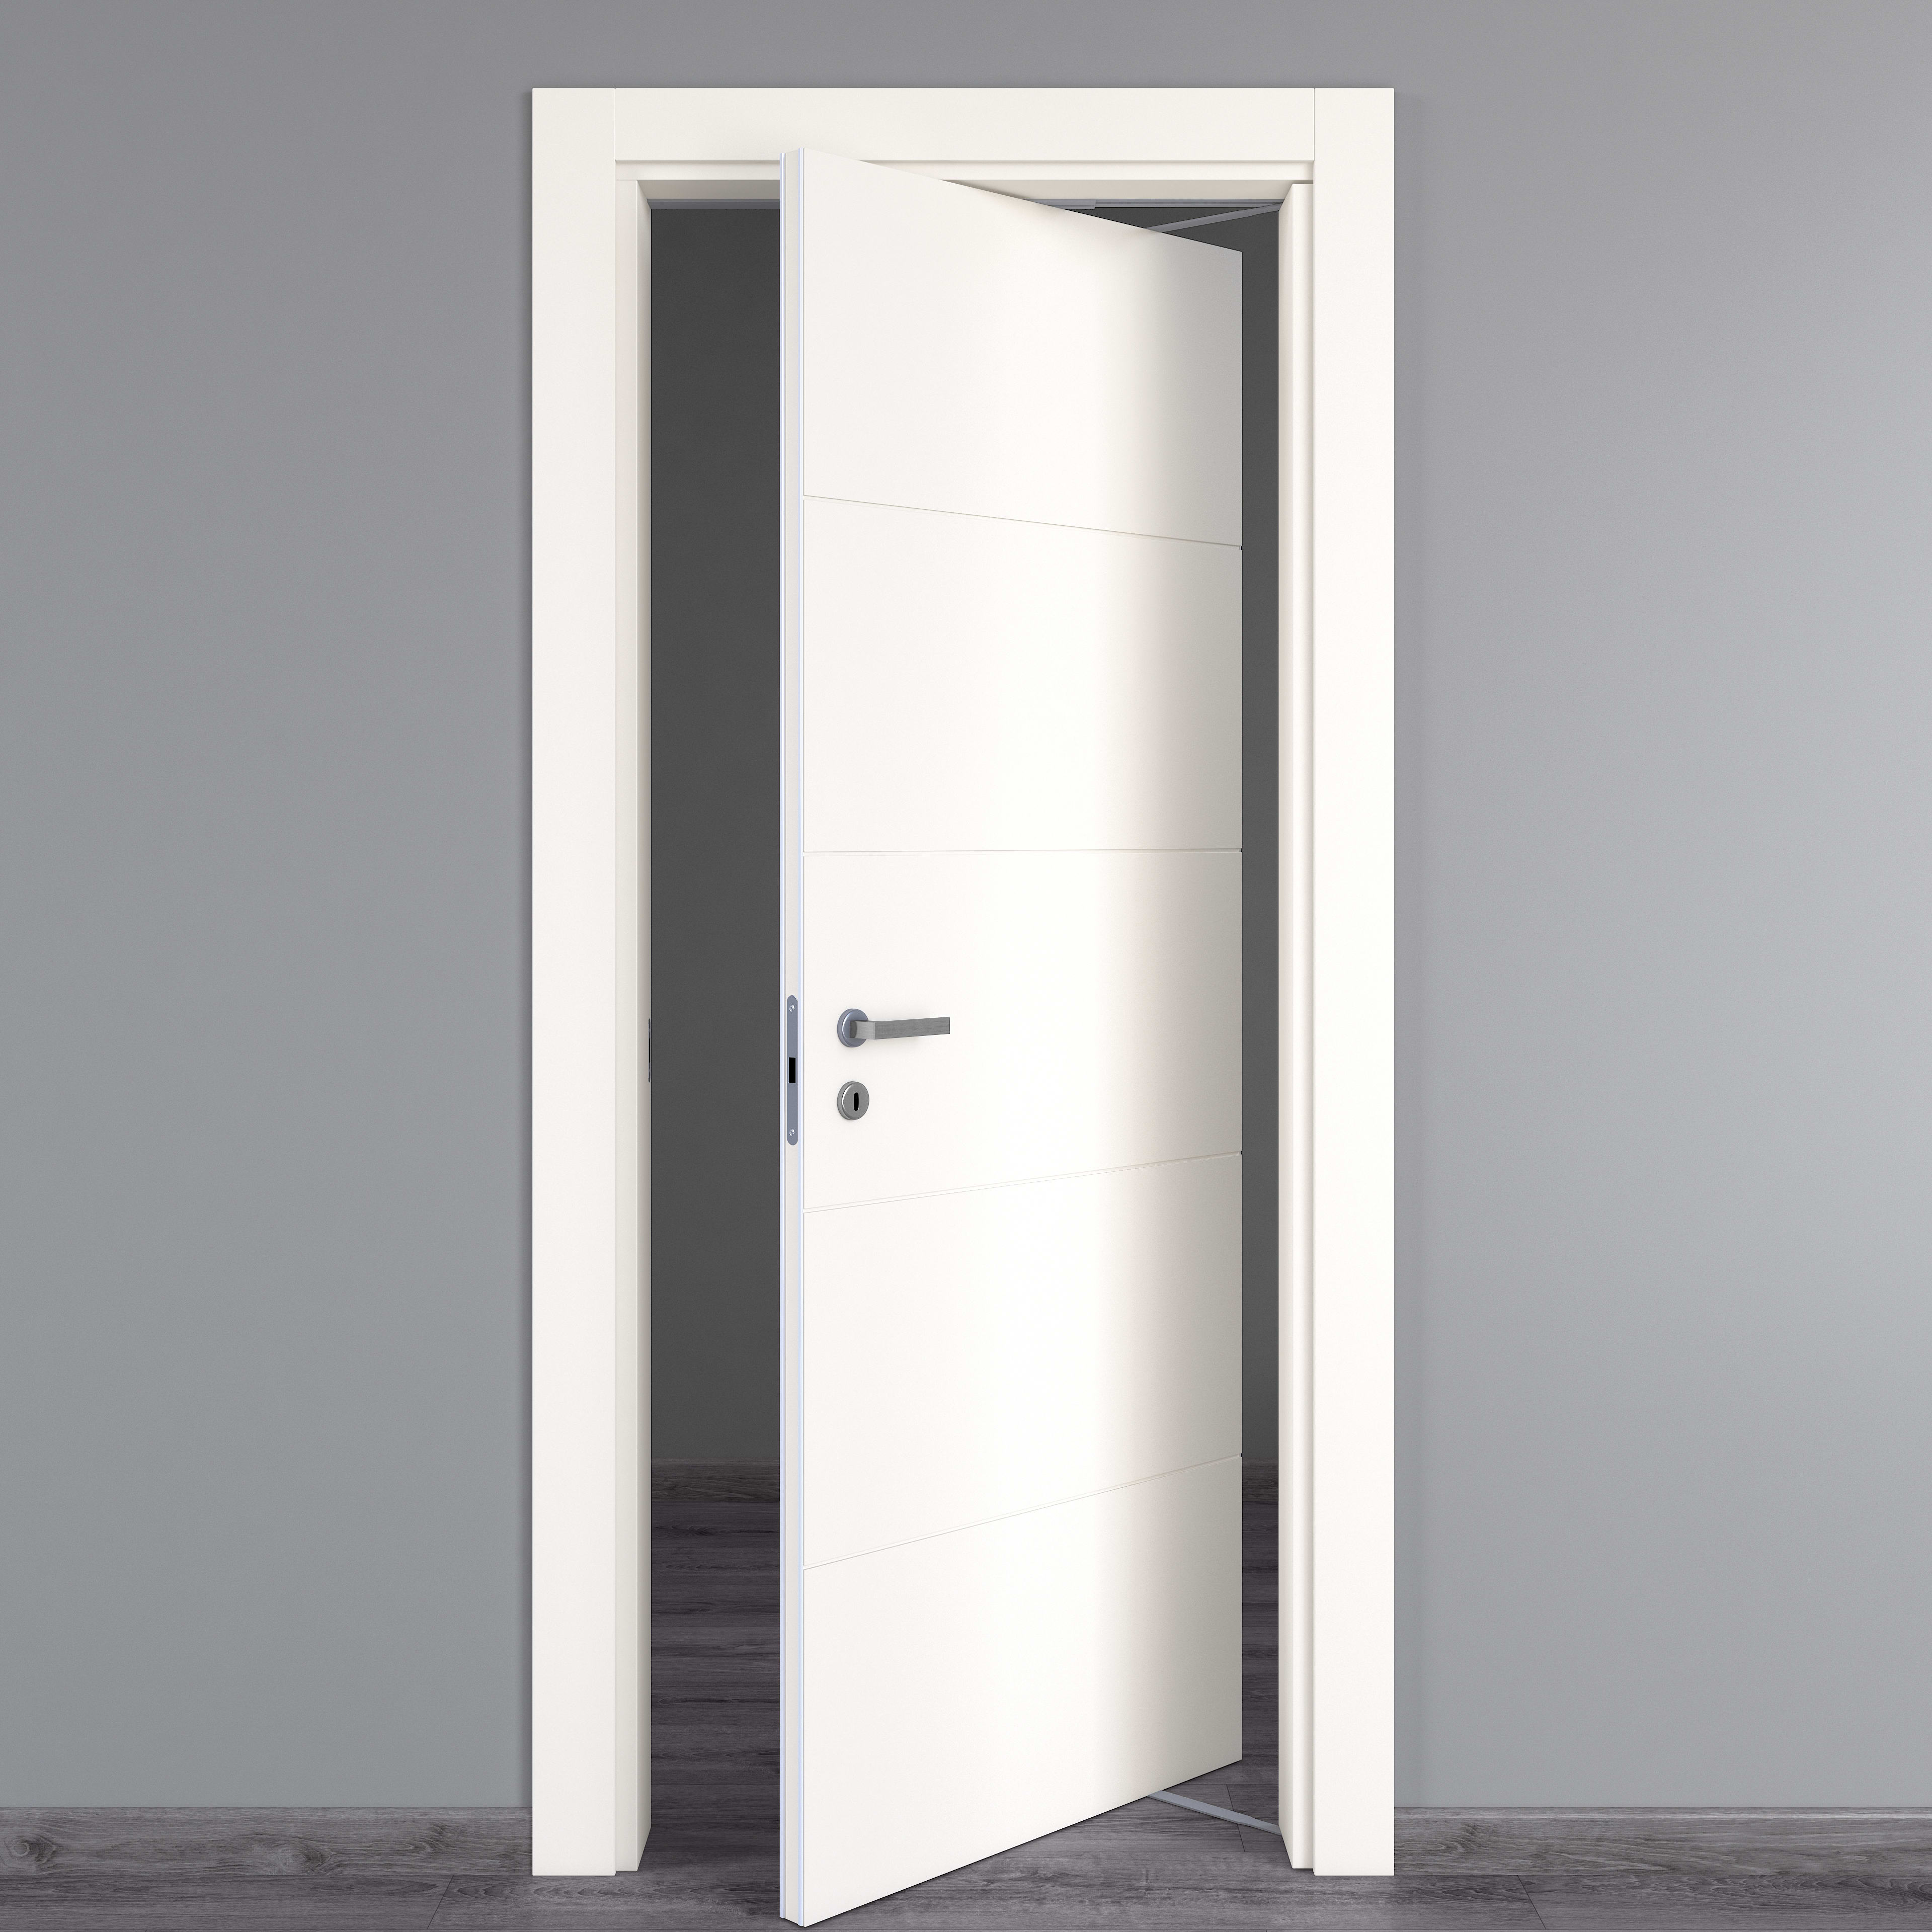 Porte Bianche Laccate Prezzi porta rototraslante prado bianco l 80 x h 210 cm destra